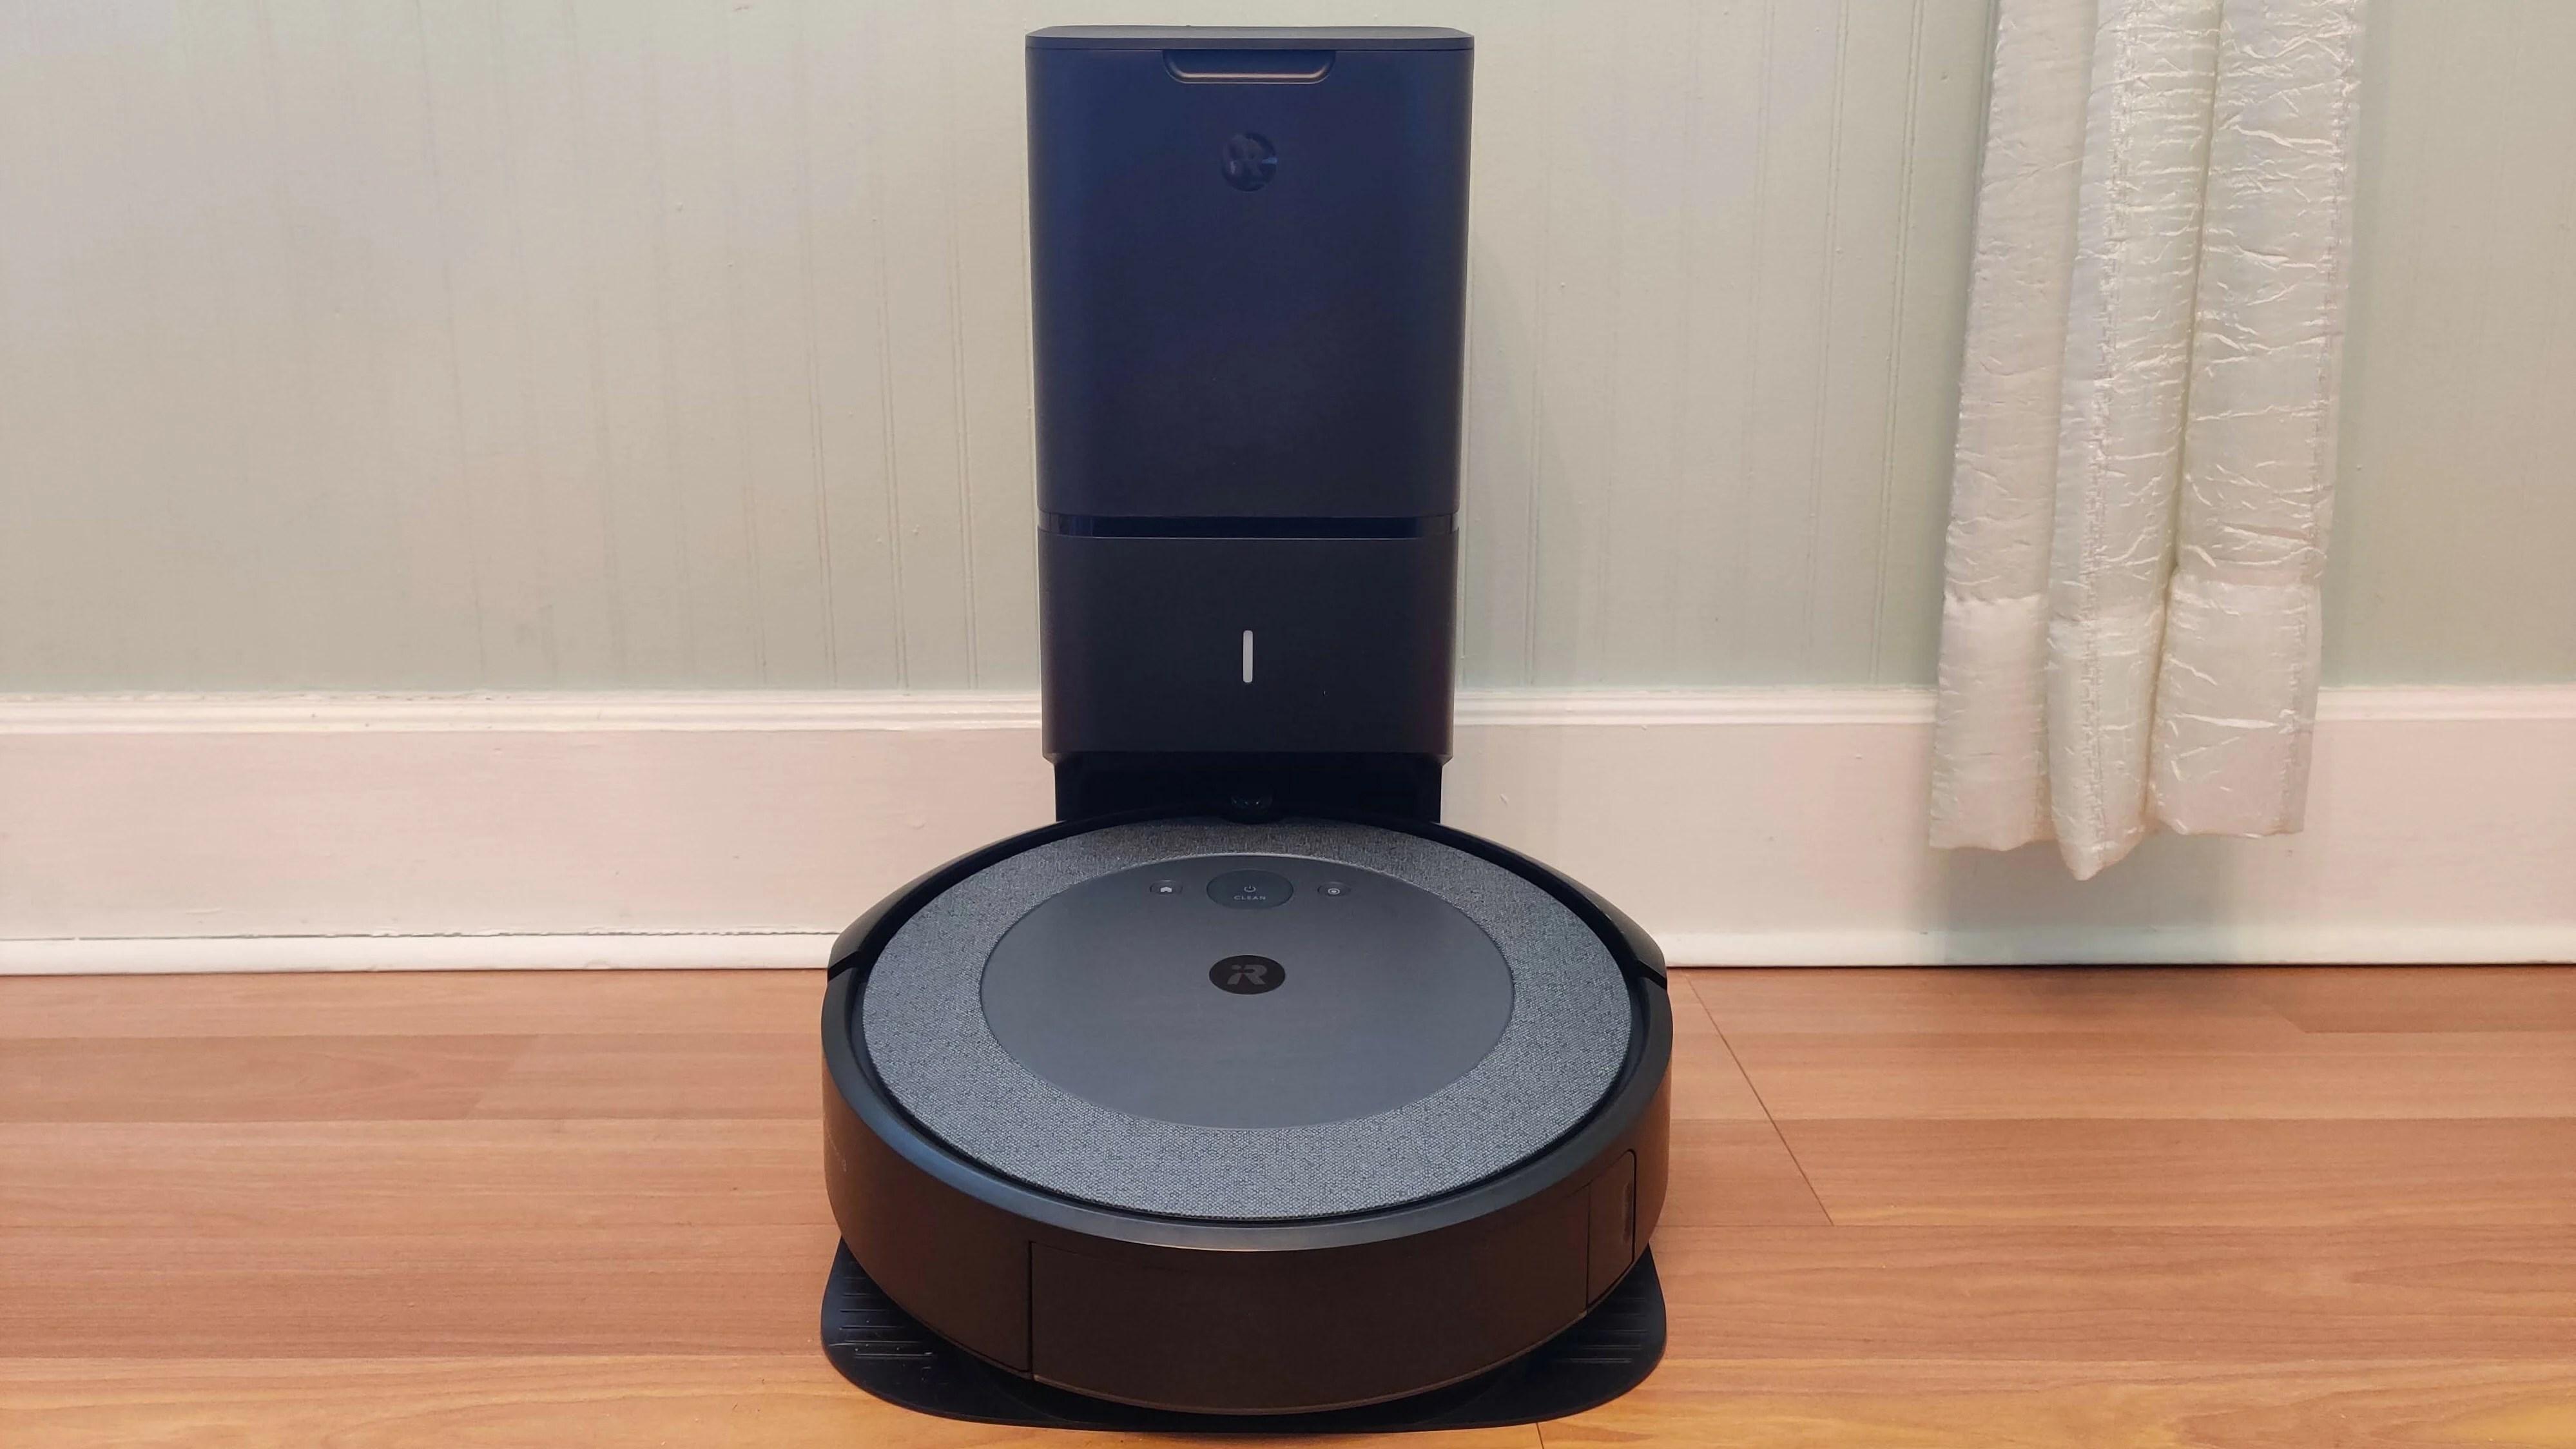 iRobot Roomba i3+ 3550